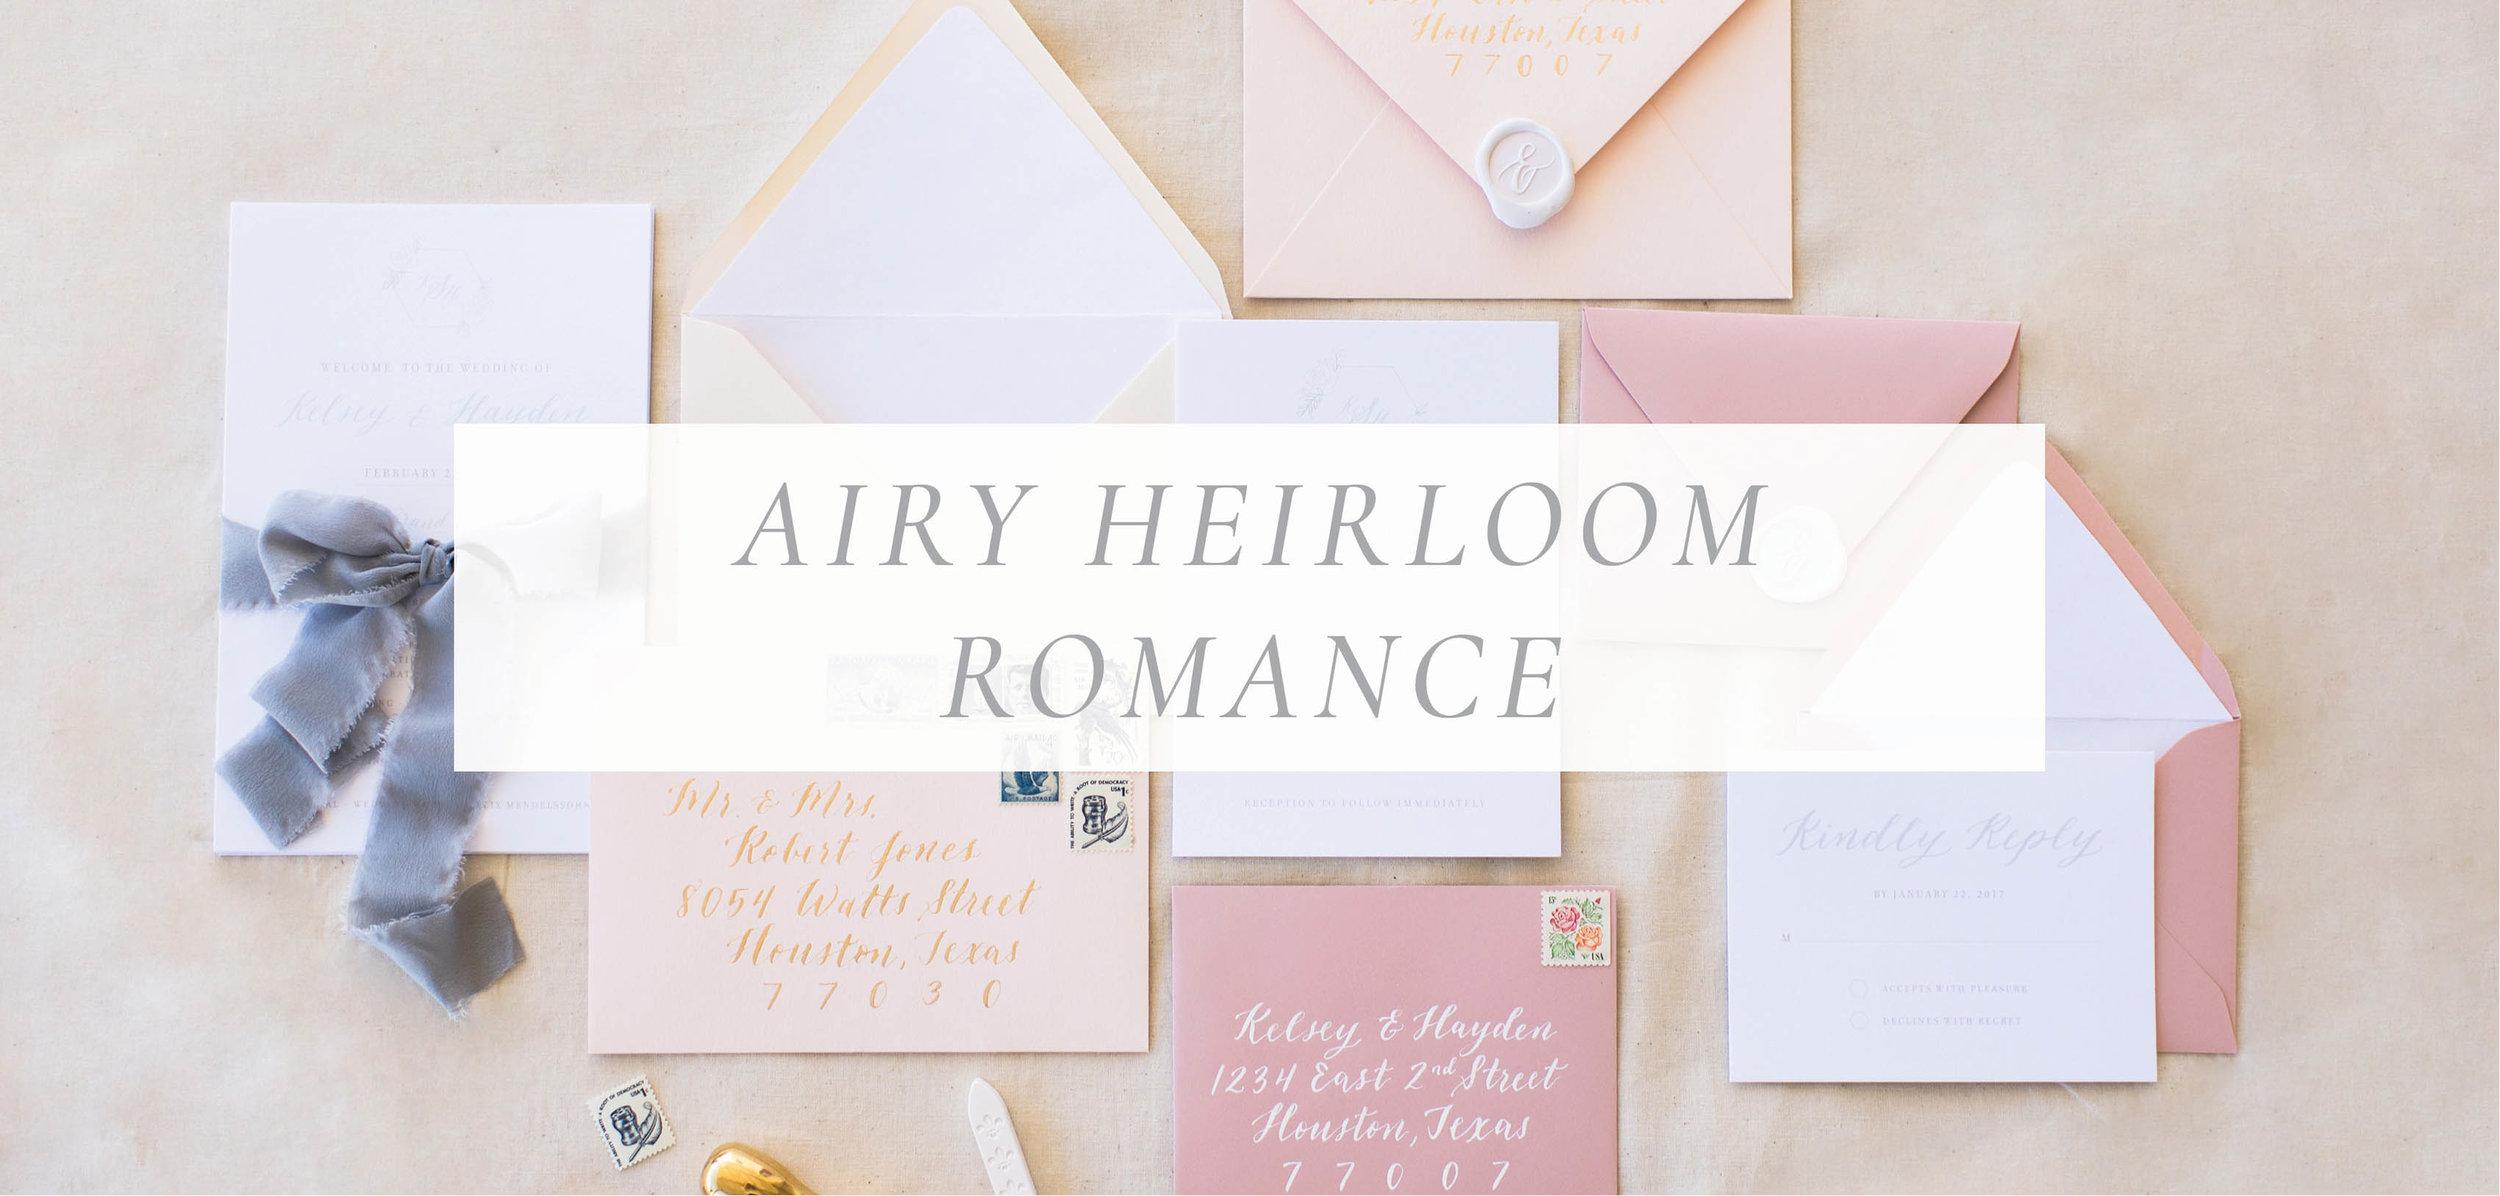 Airy Heirloom Romance.jpg